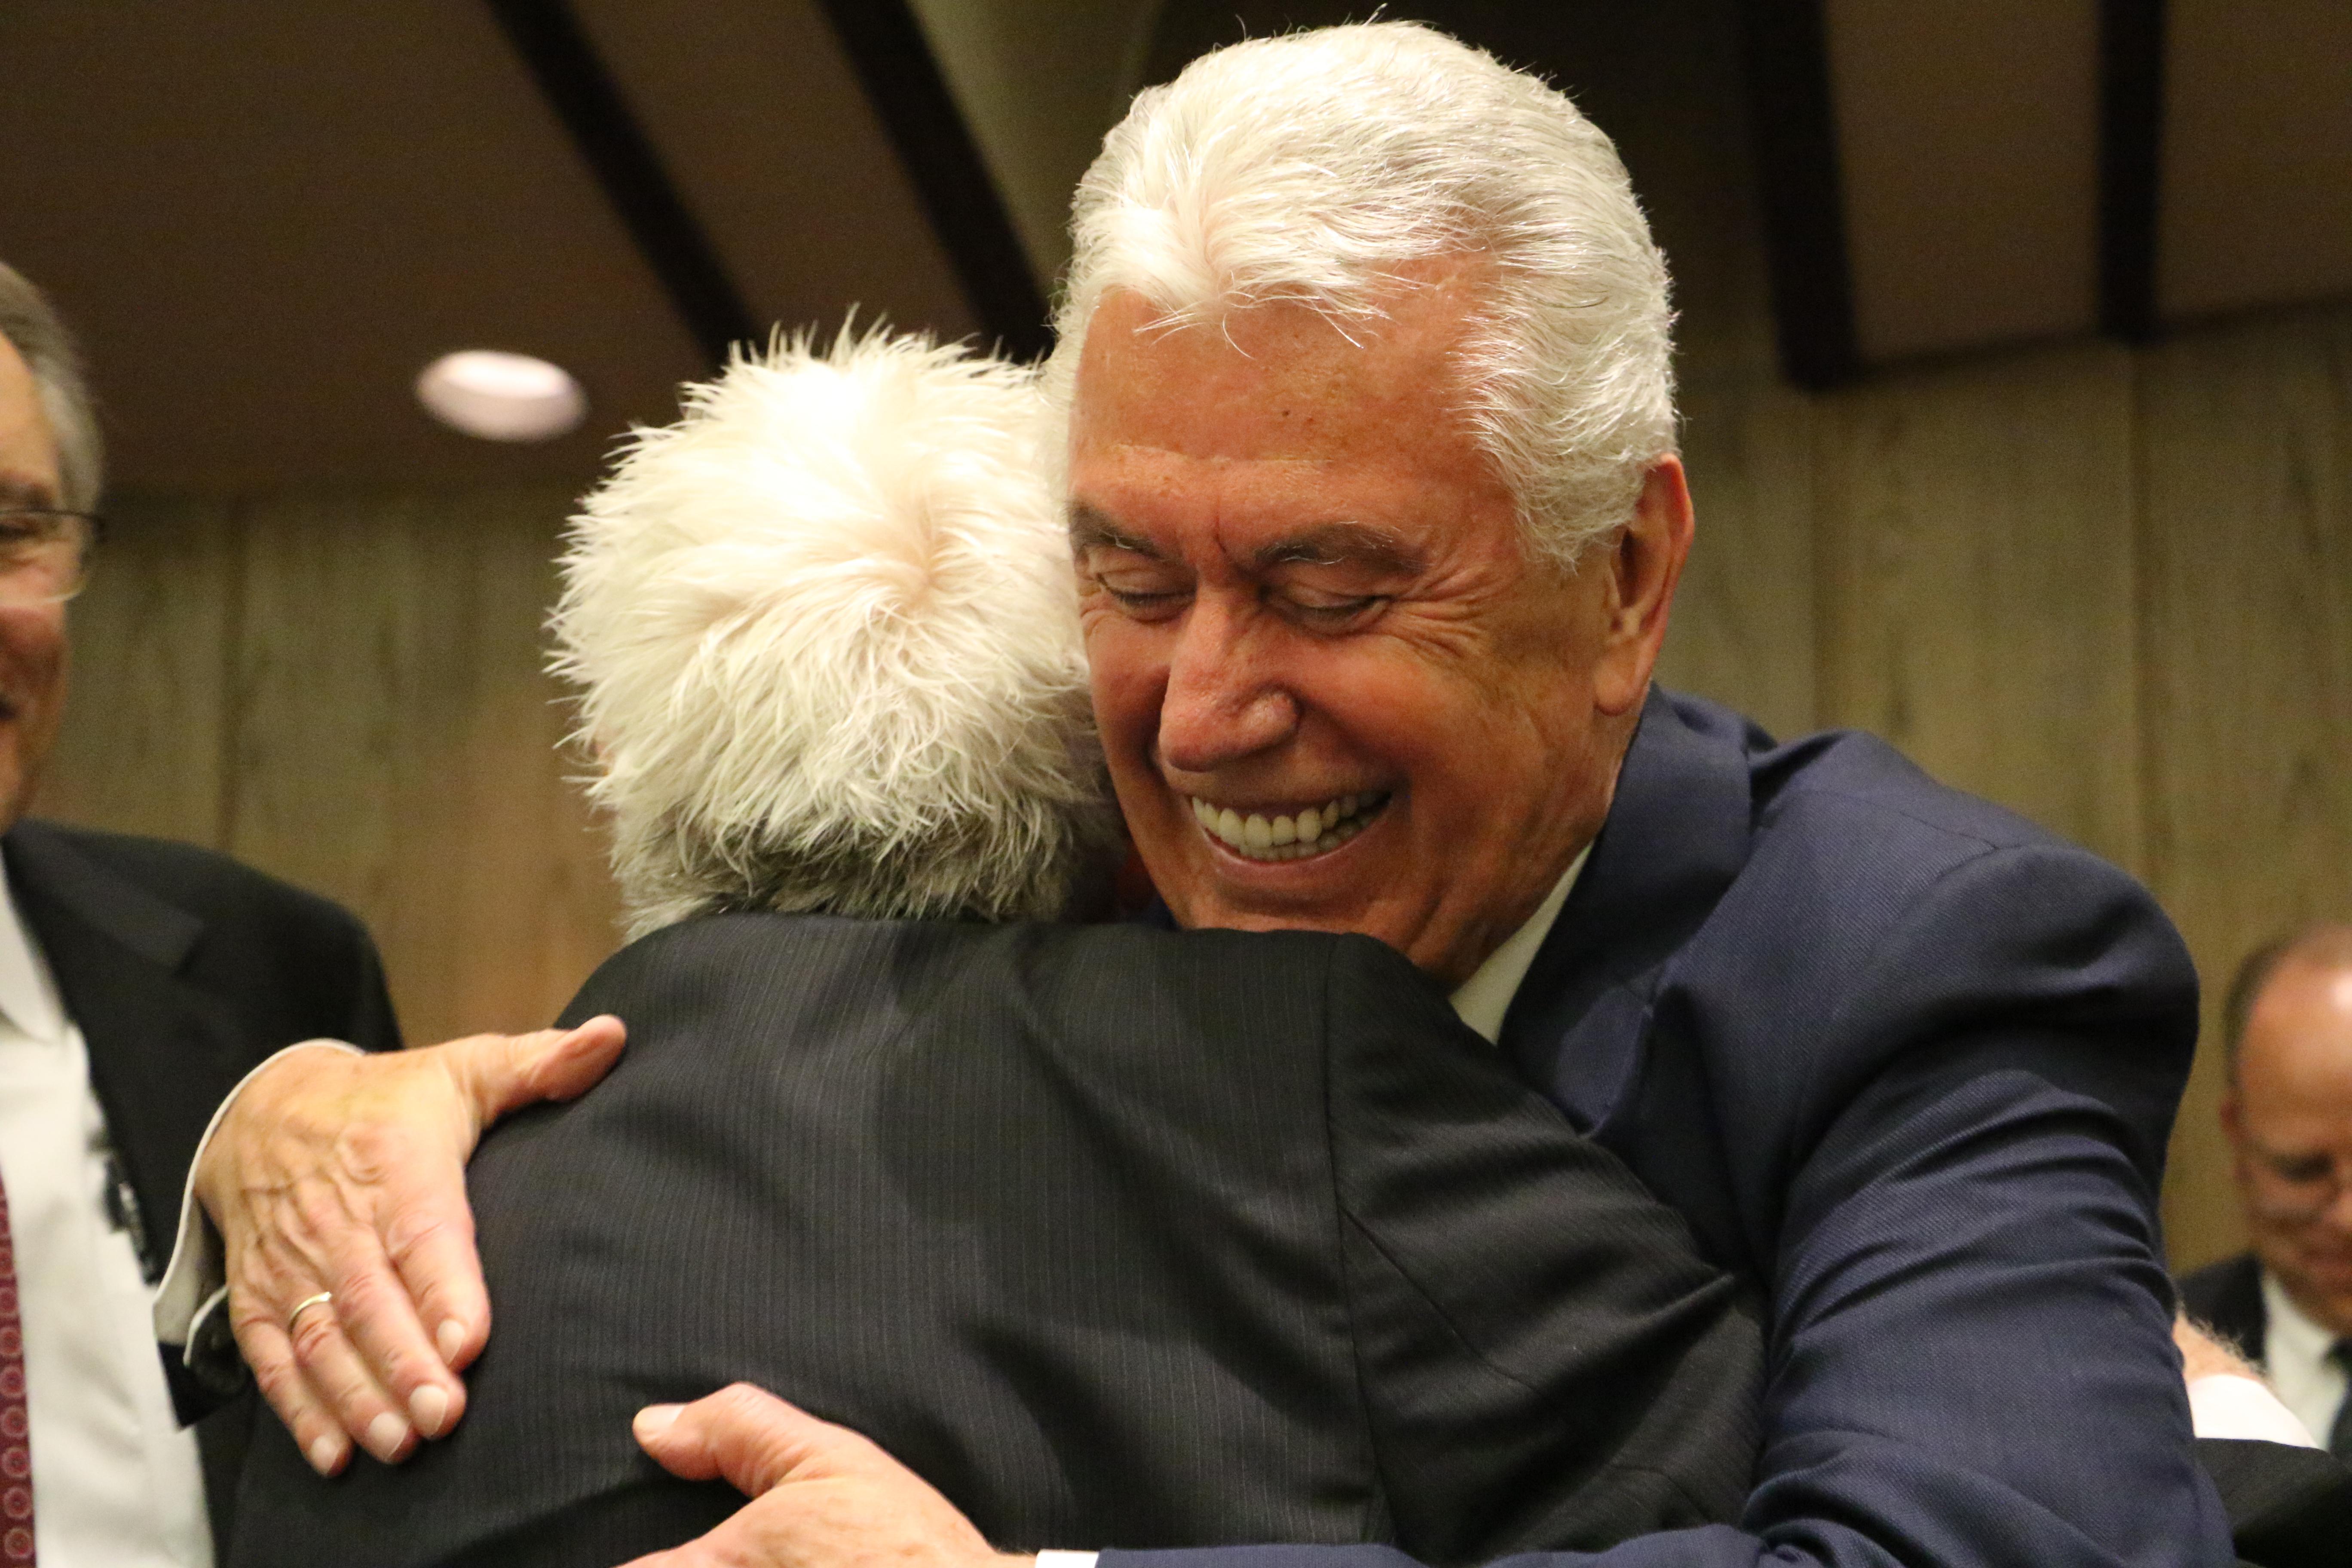 Elder Dieter F. Uchtdorf of the Quorum of the Twelve Apostles hugs a member of the German Speaking Ward after the final sacrament meeting on July 14, 2019, in Salt Lake City.